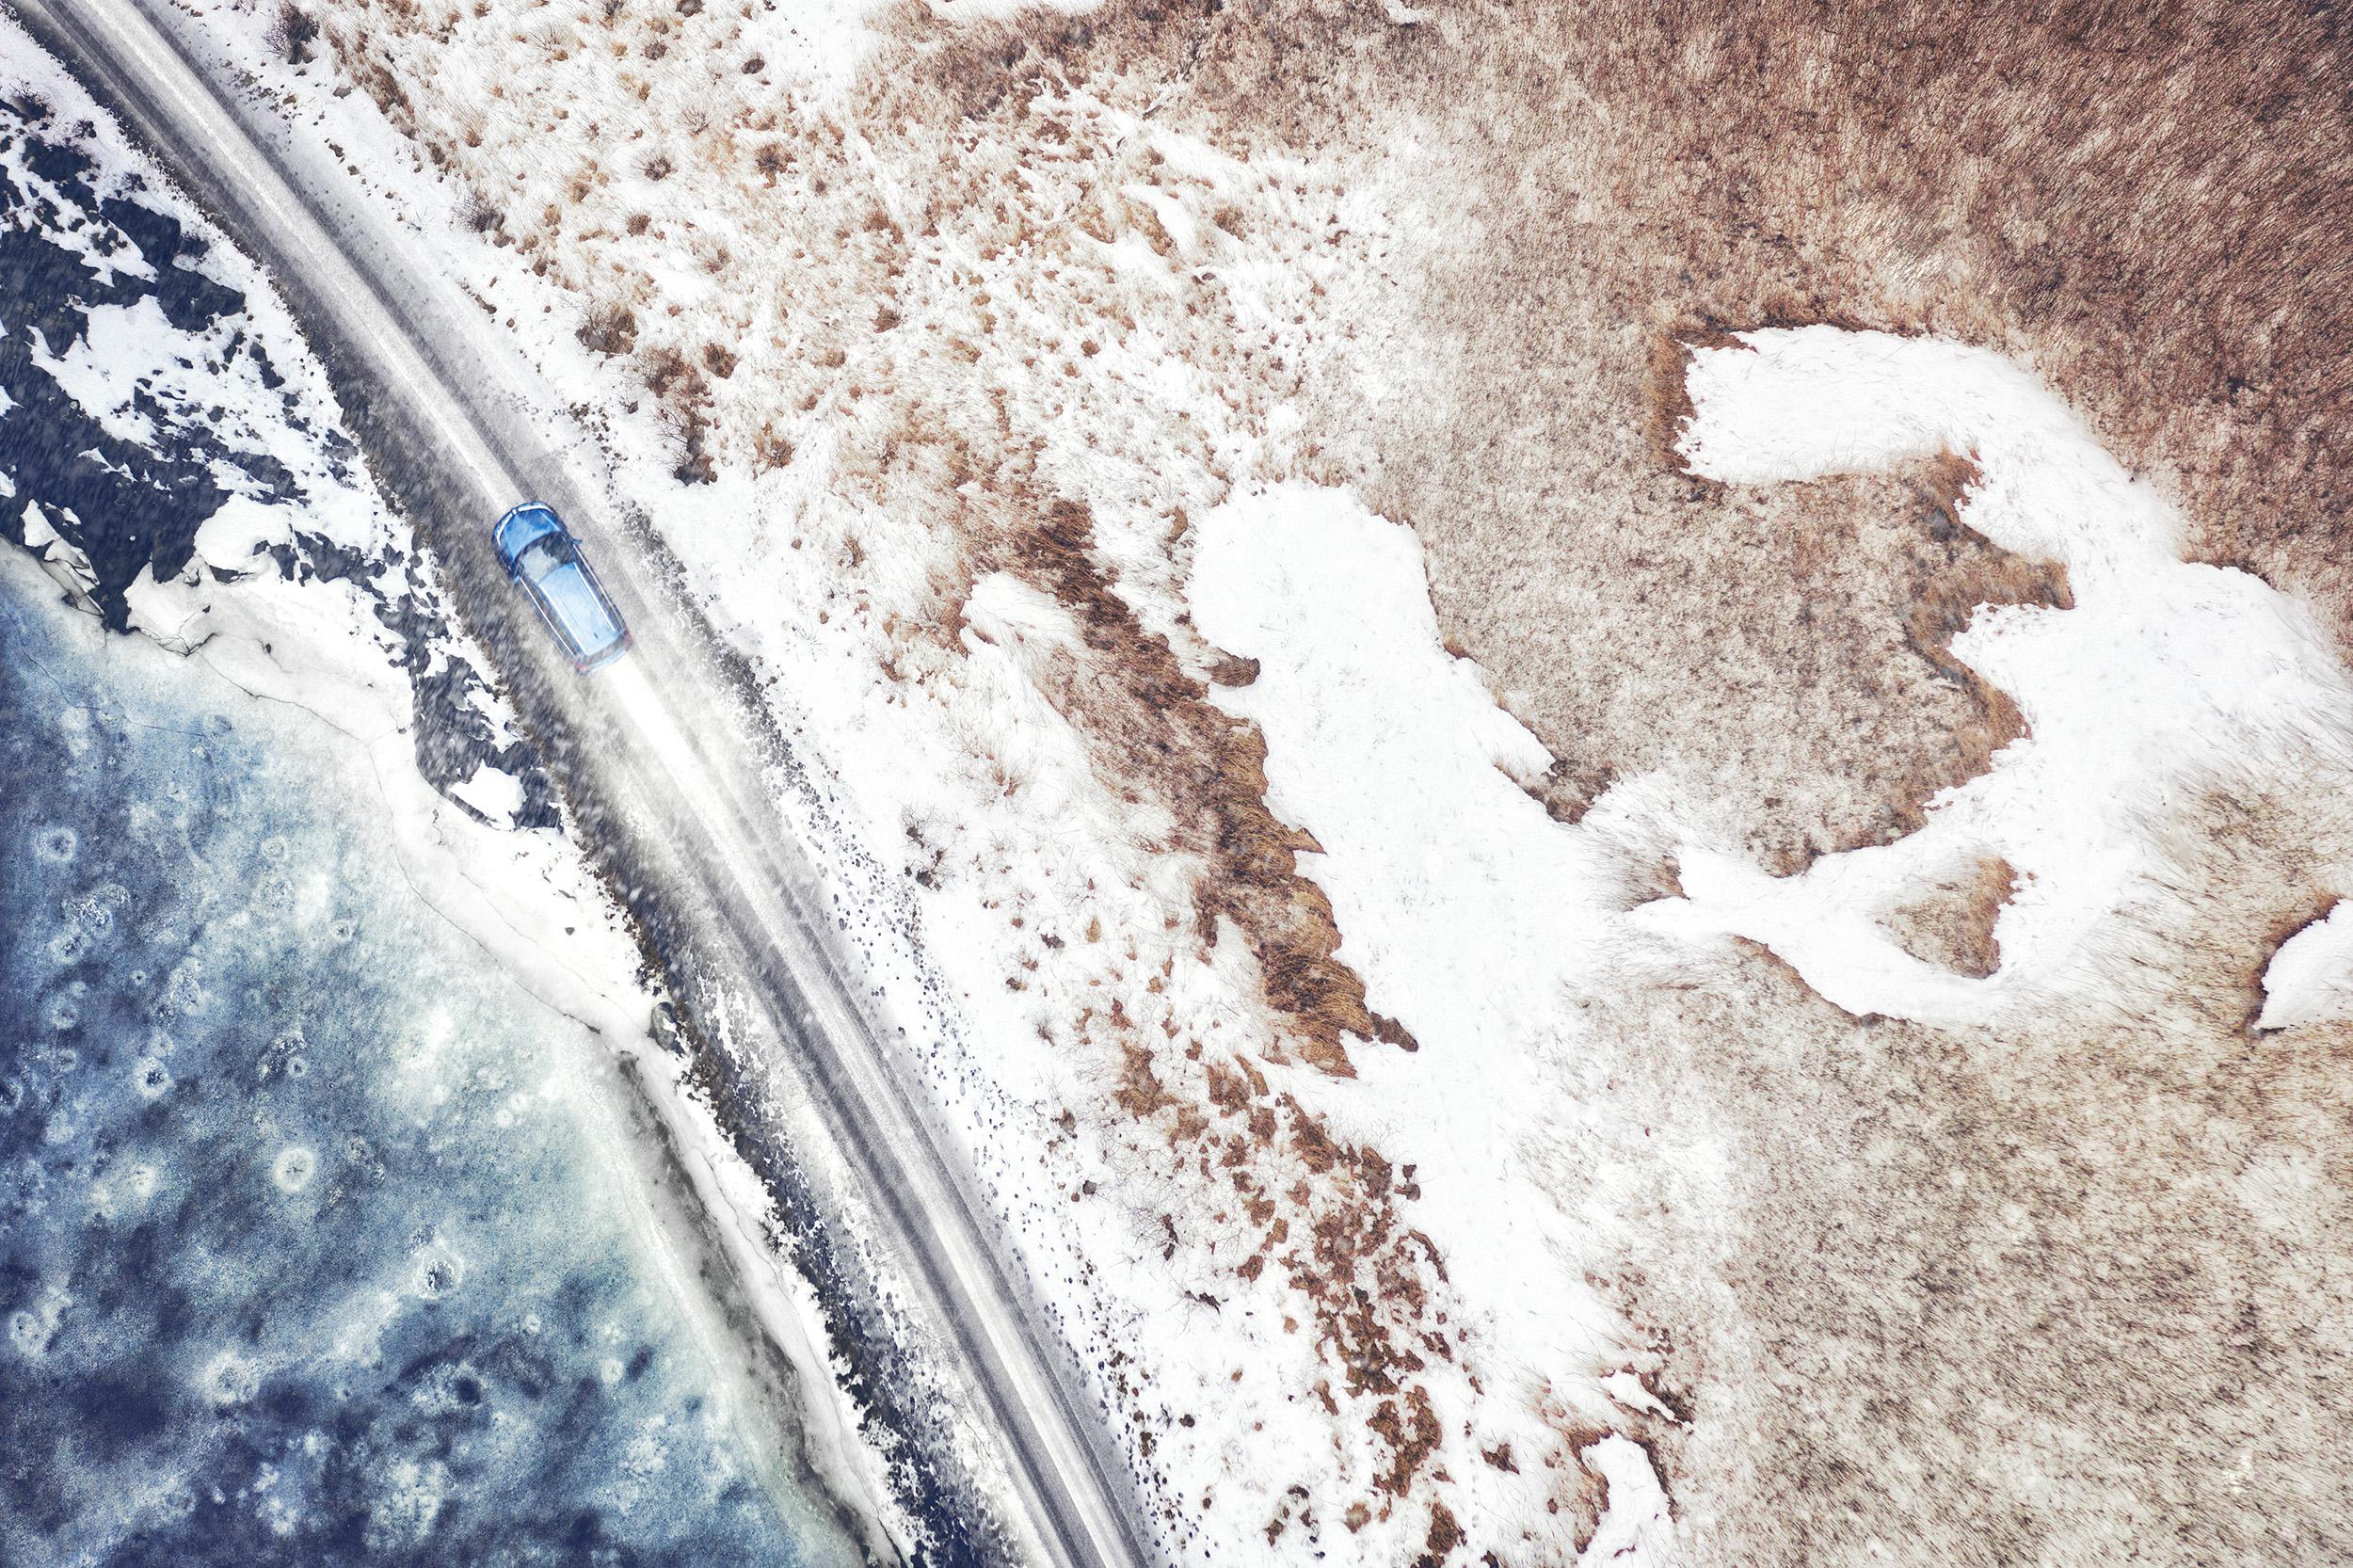 Aerial_snowroad_Car_2019.jpg